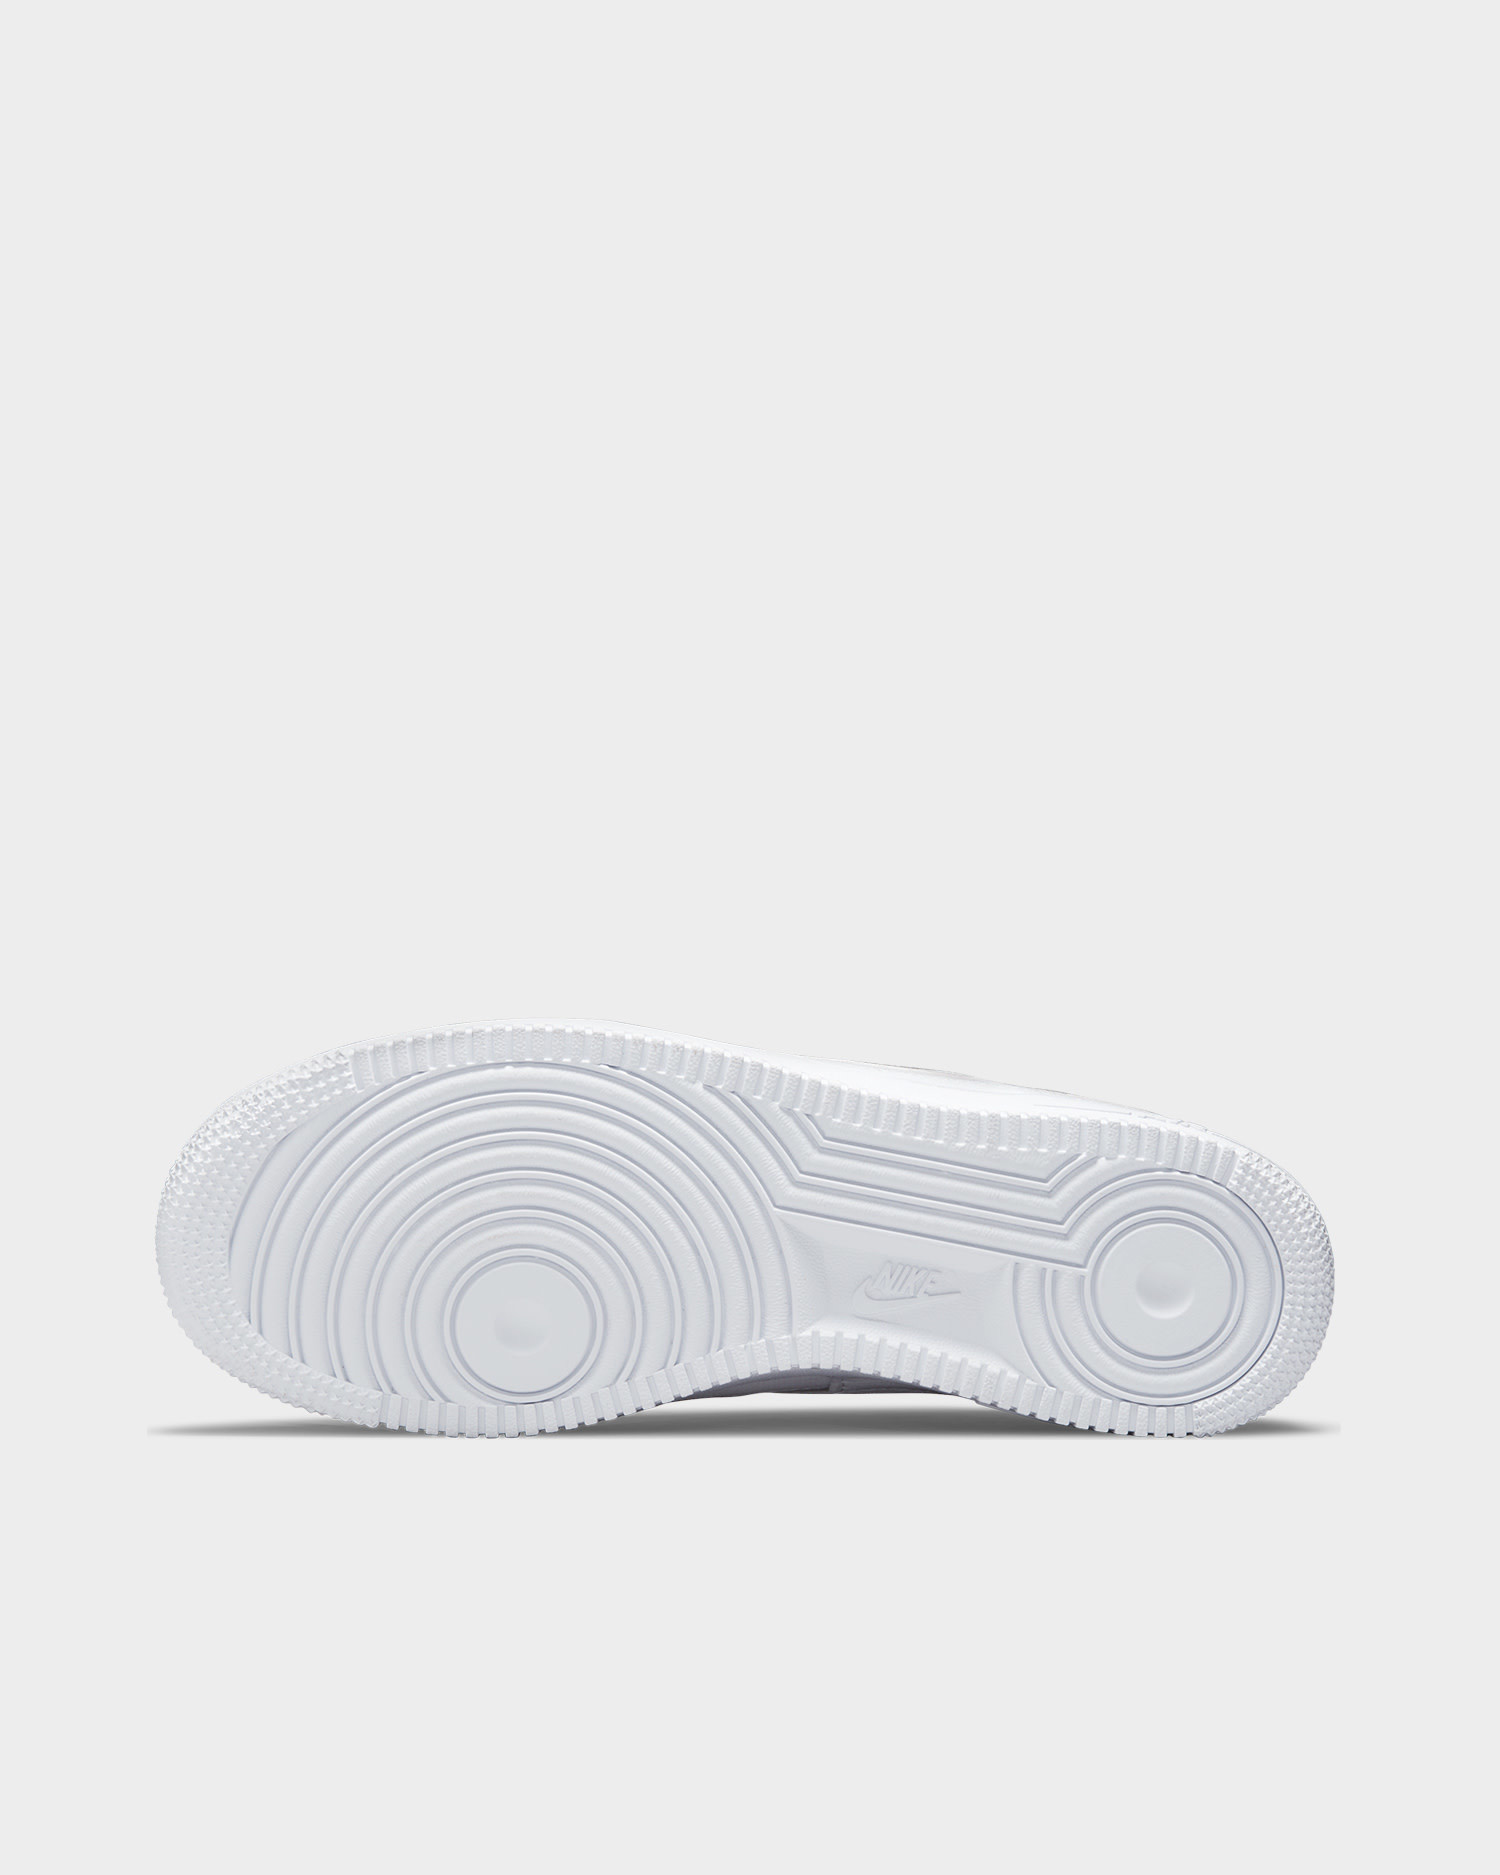 Nike Wmns air force 1 '07 prm Fauna brown/arctic punch-pale vanilla